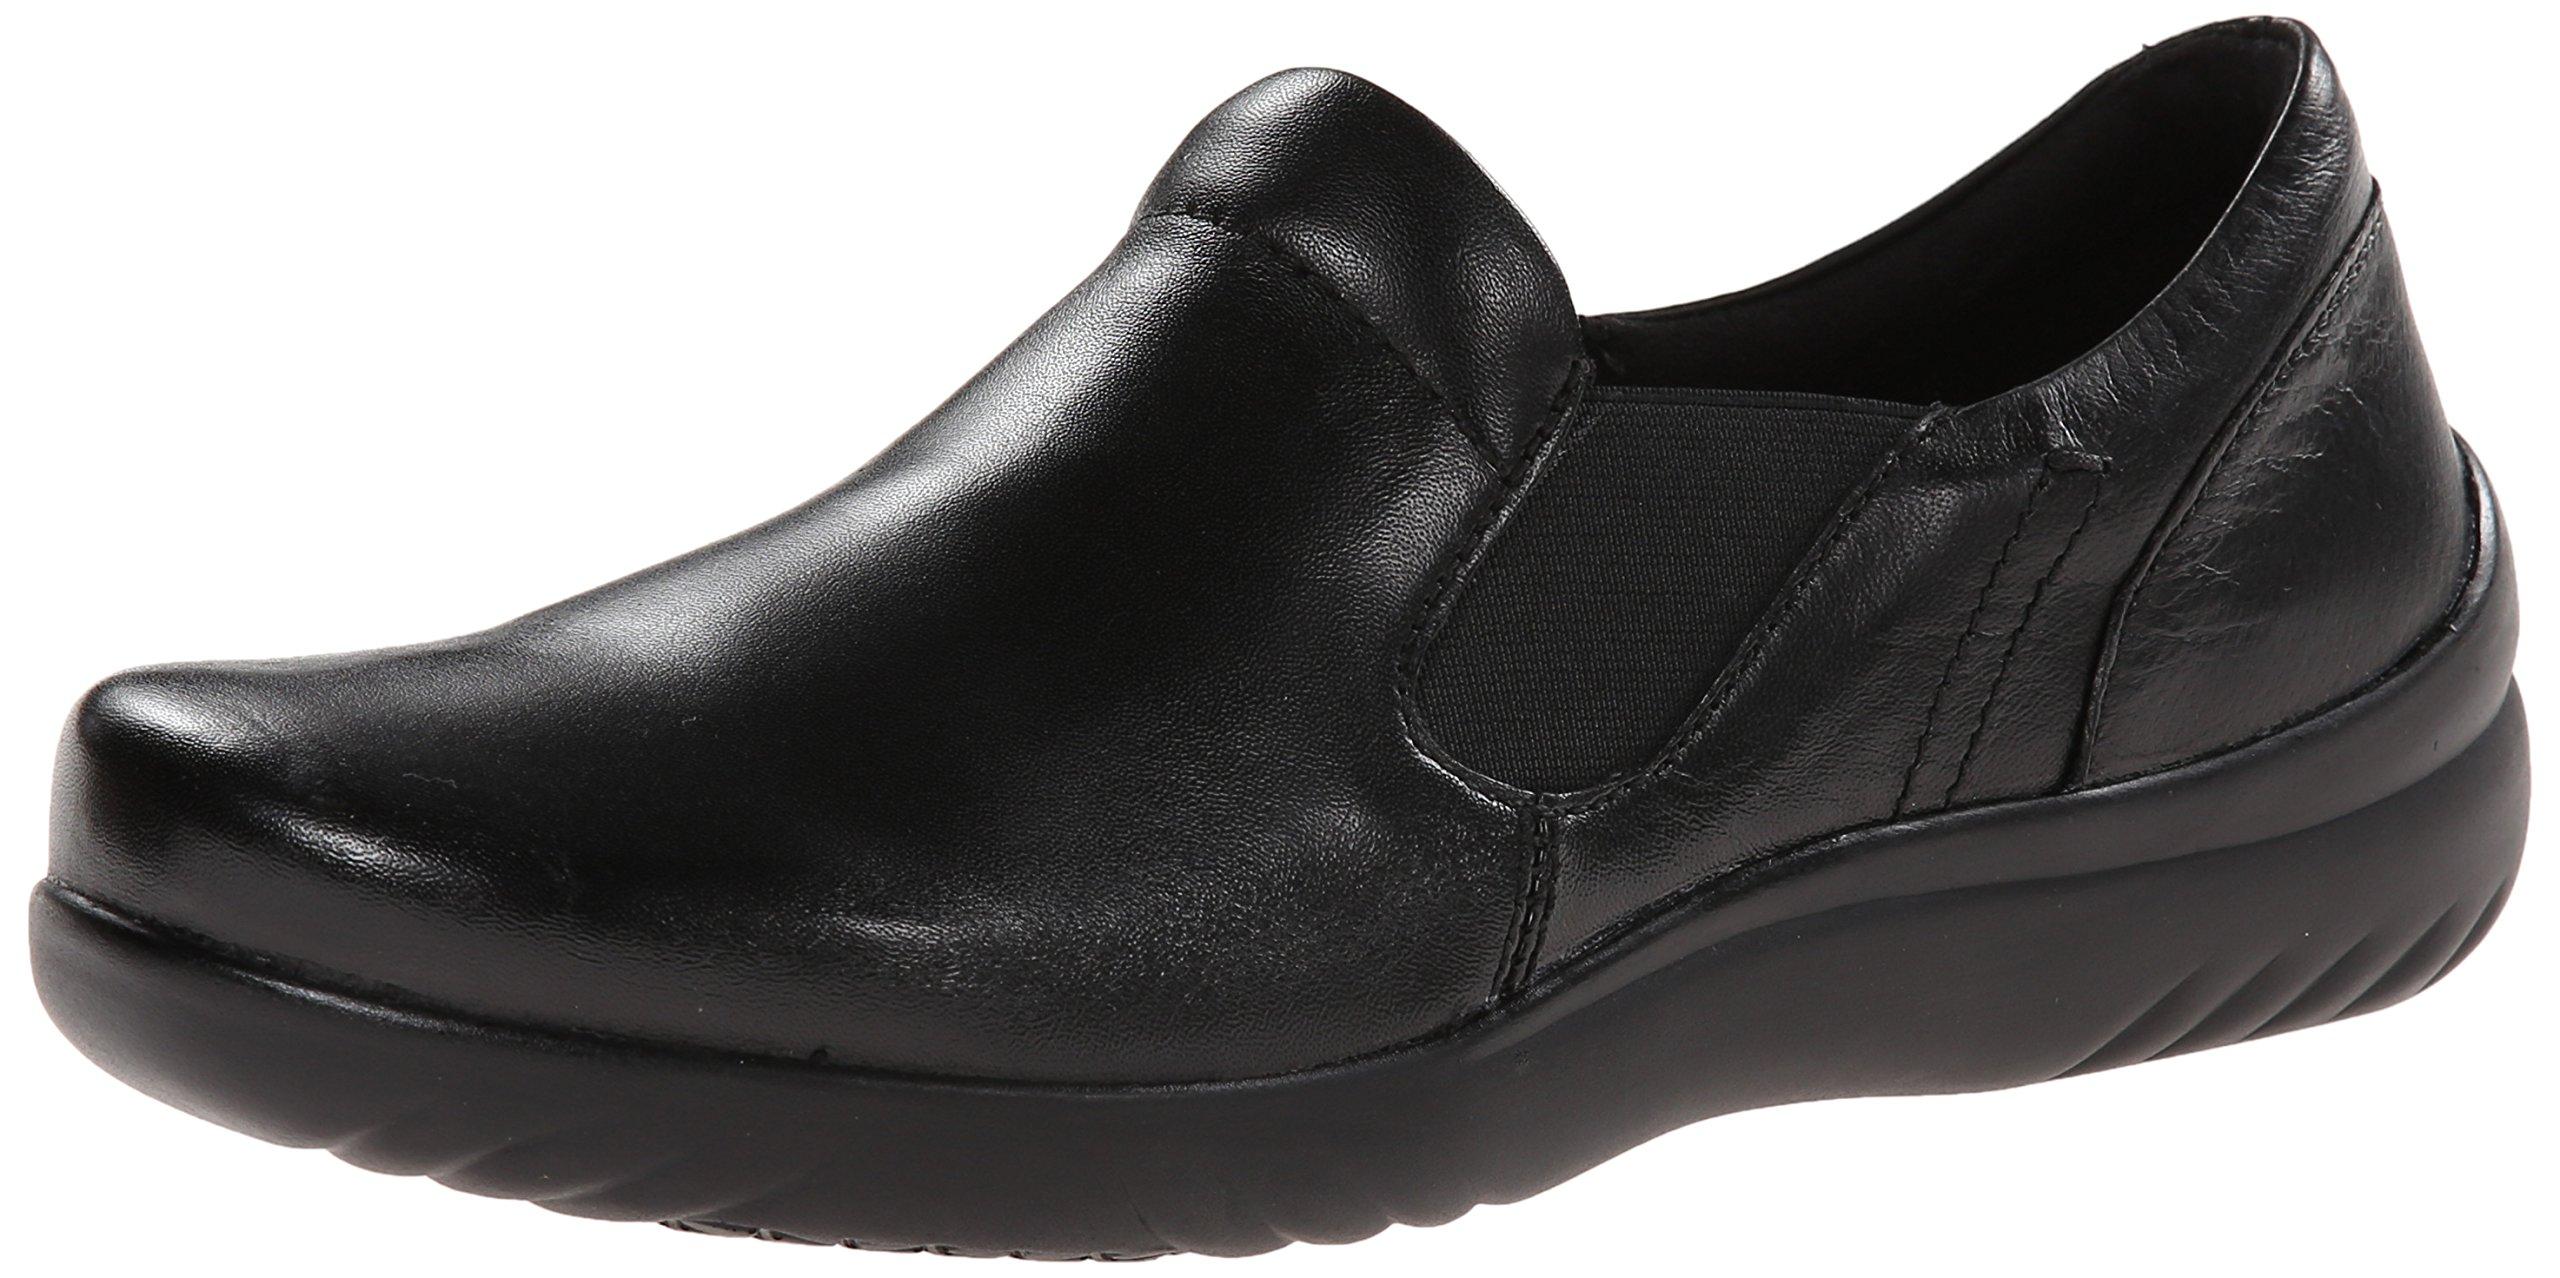 Klogs USA Women's Geneva Slip-On Shoe, Black Smooth, 6 M US